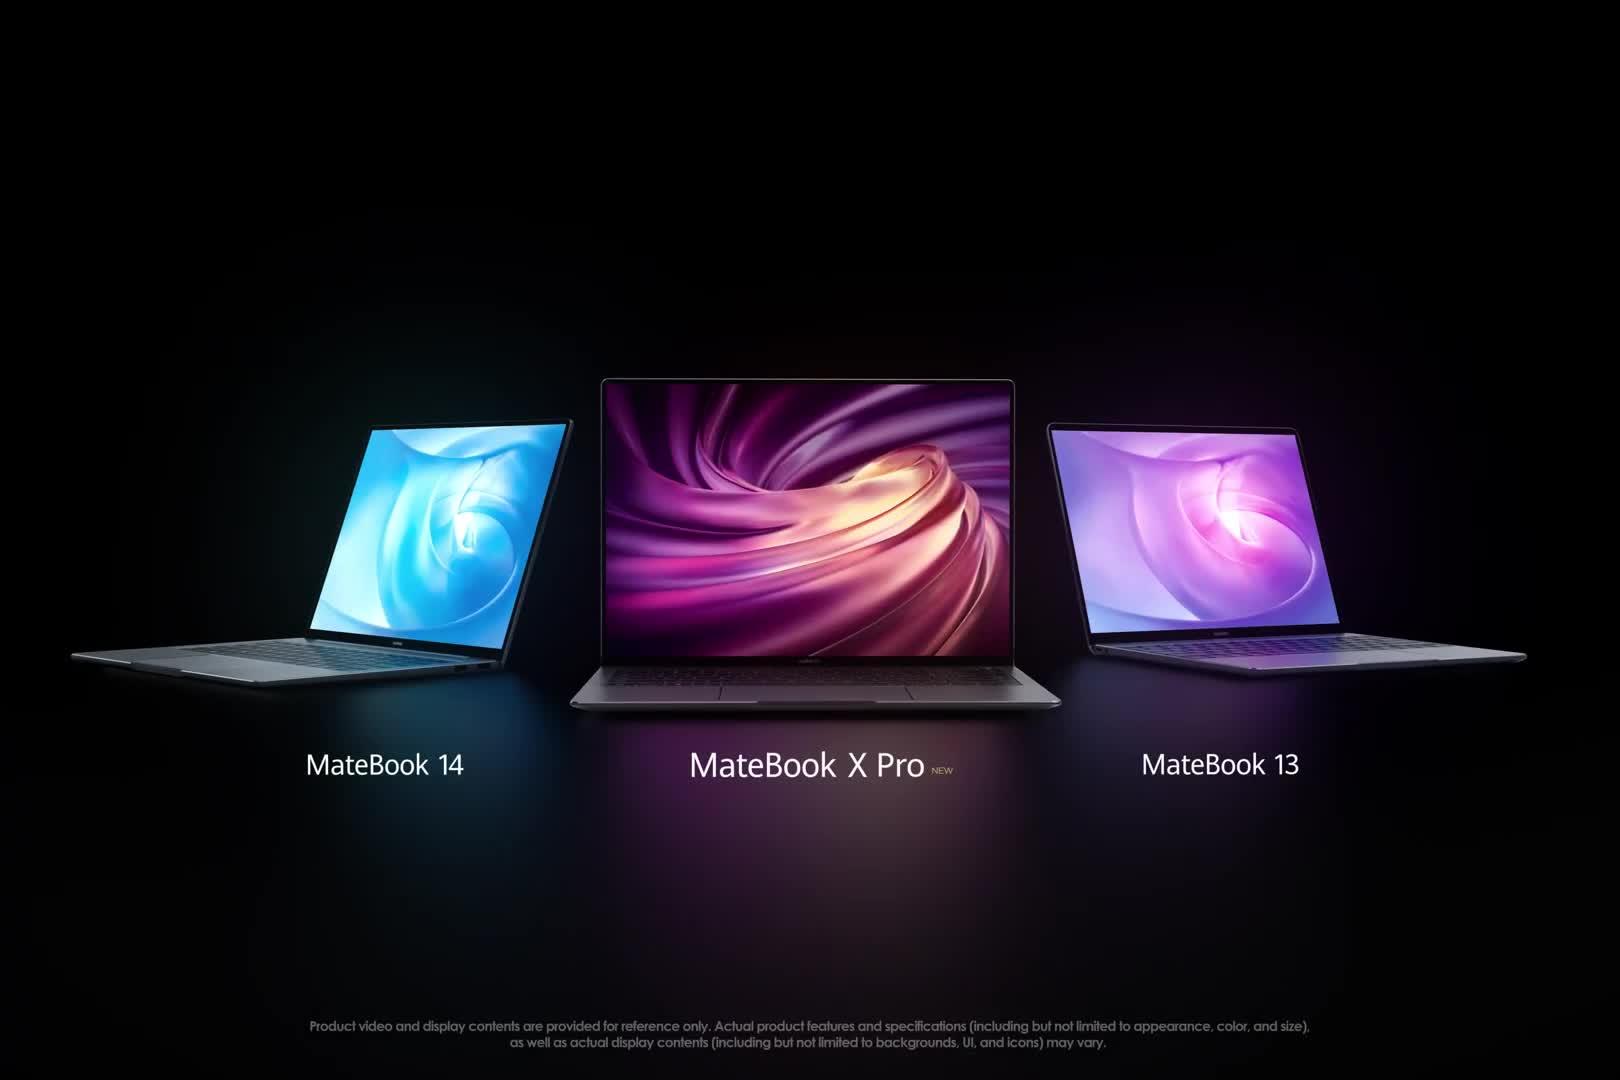 Notebook, Huawei, Laptop, Mwc, Mobile World Congress, MWC 2019, Mobile World Congress 2019, Huawei MateBook X Pro, MateBook X Pro, Huawei MateBook 13, Matebook 13, MateBook 14, Huawei MateBook 14